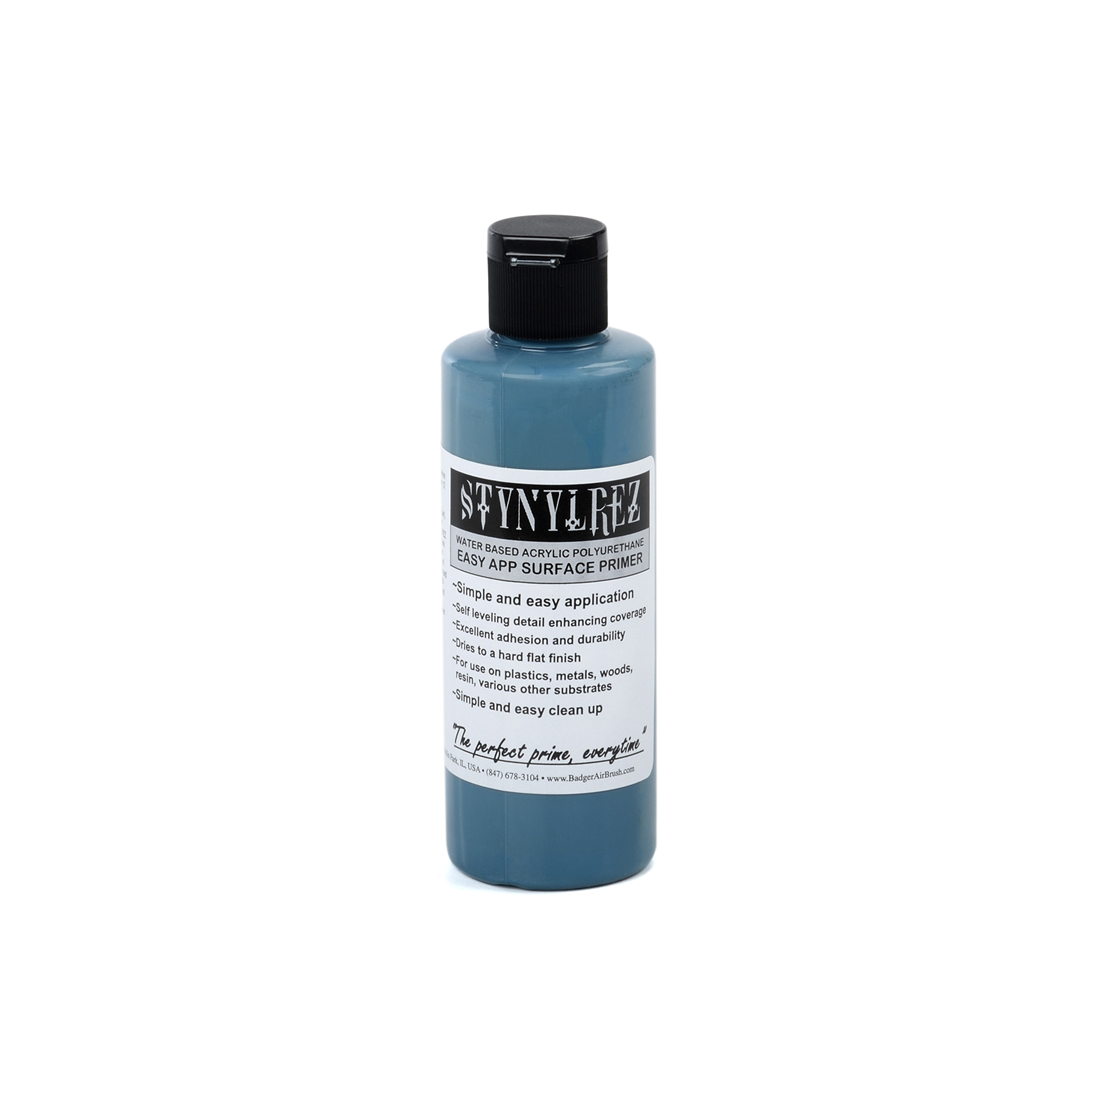 411 Badger Stynylrez ocean blu 120 ml.